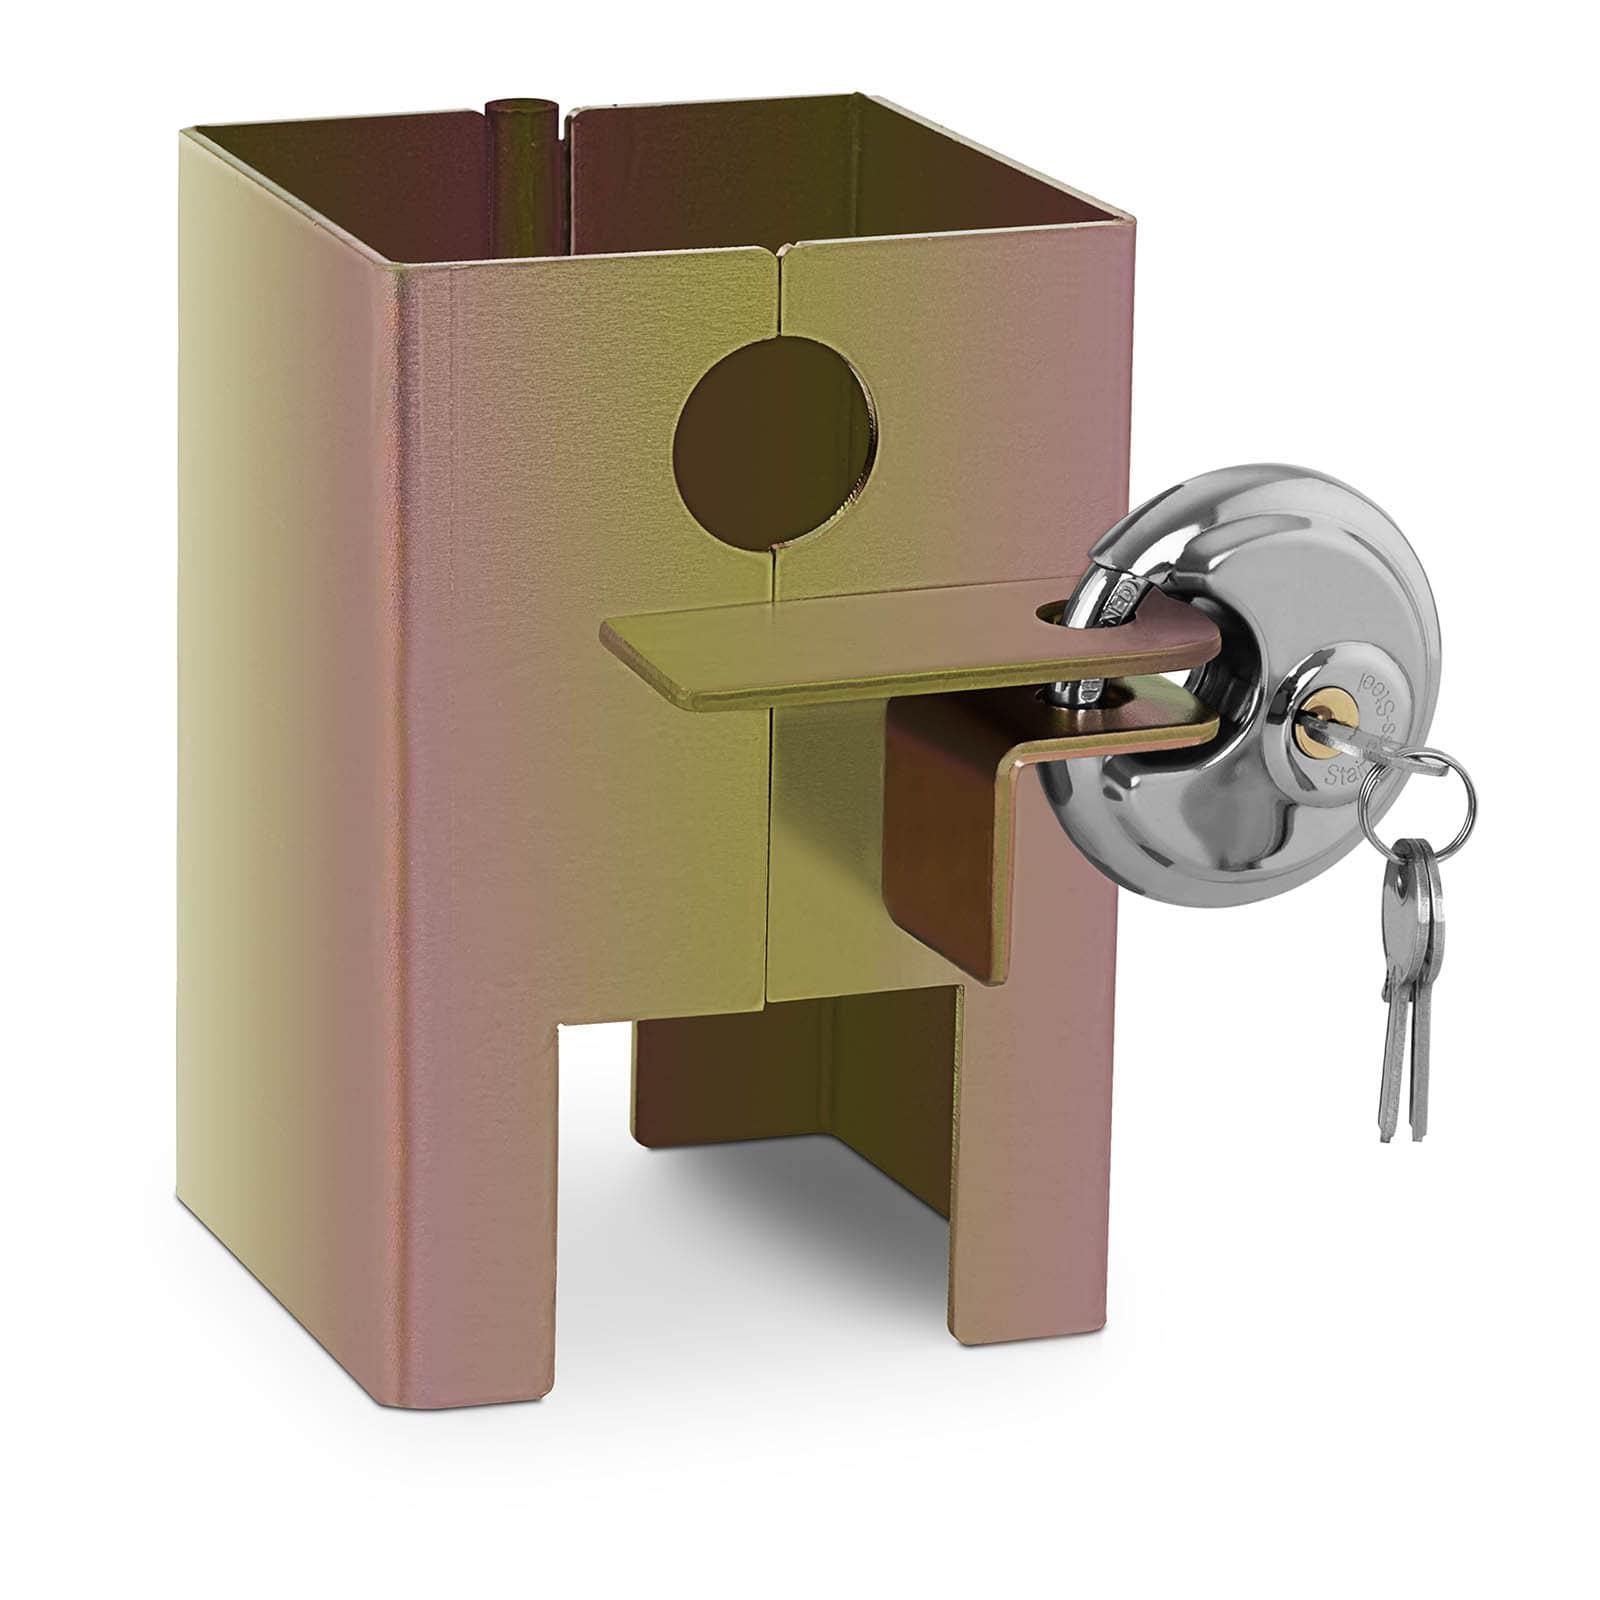 Dispositivos anti-roubo